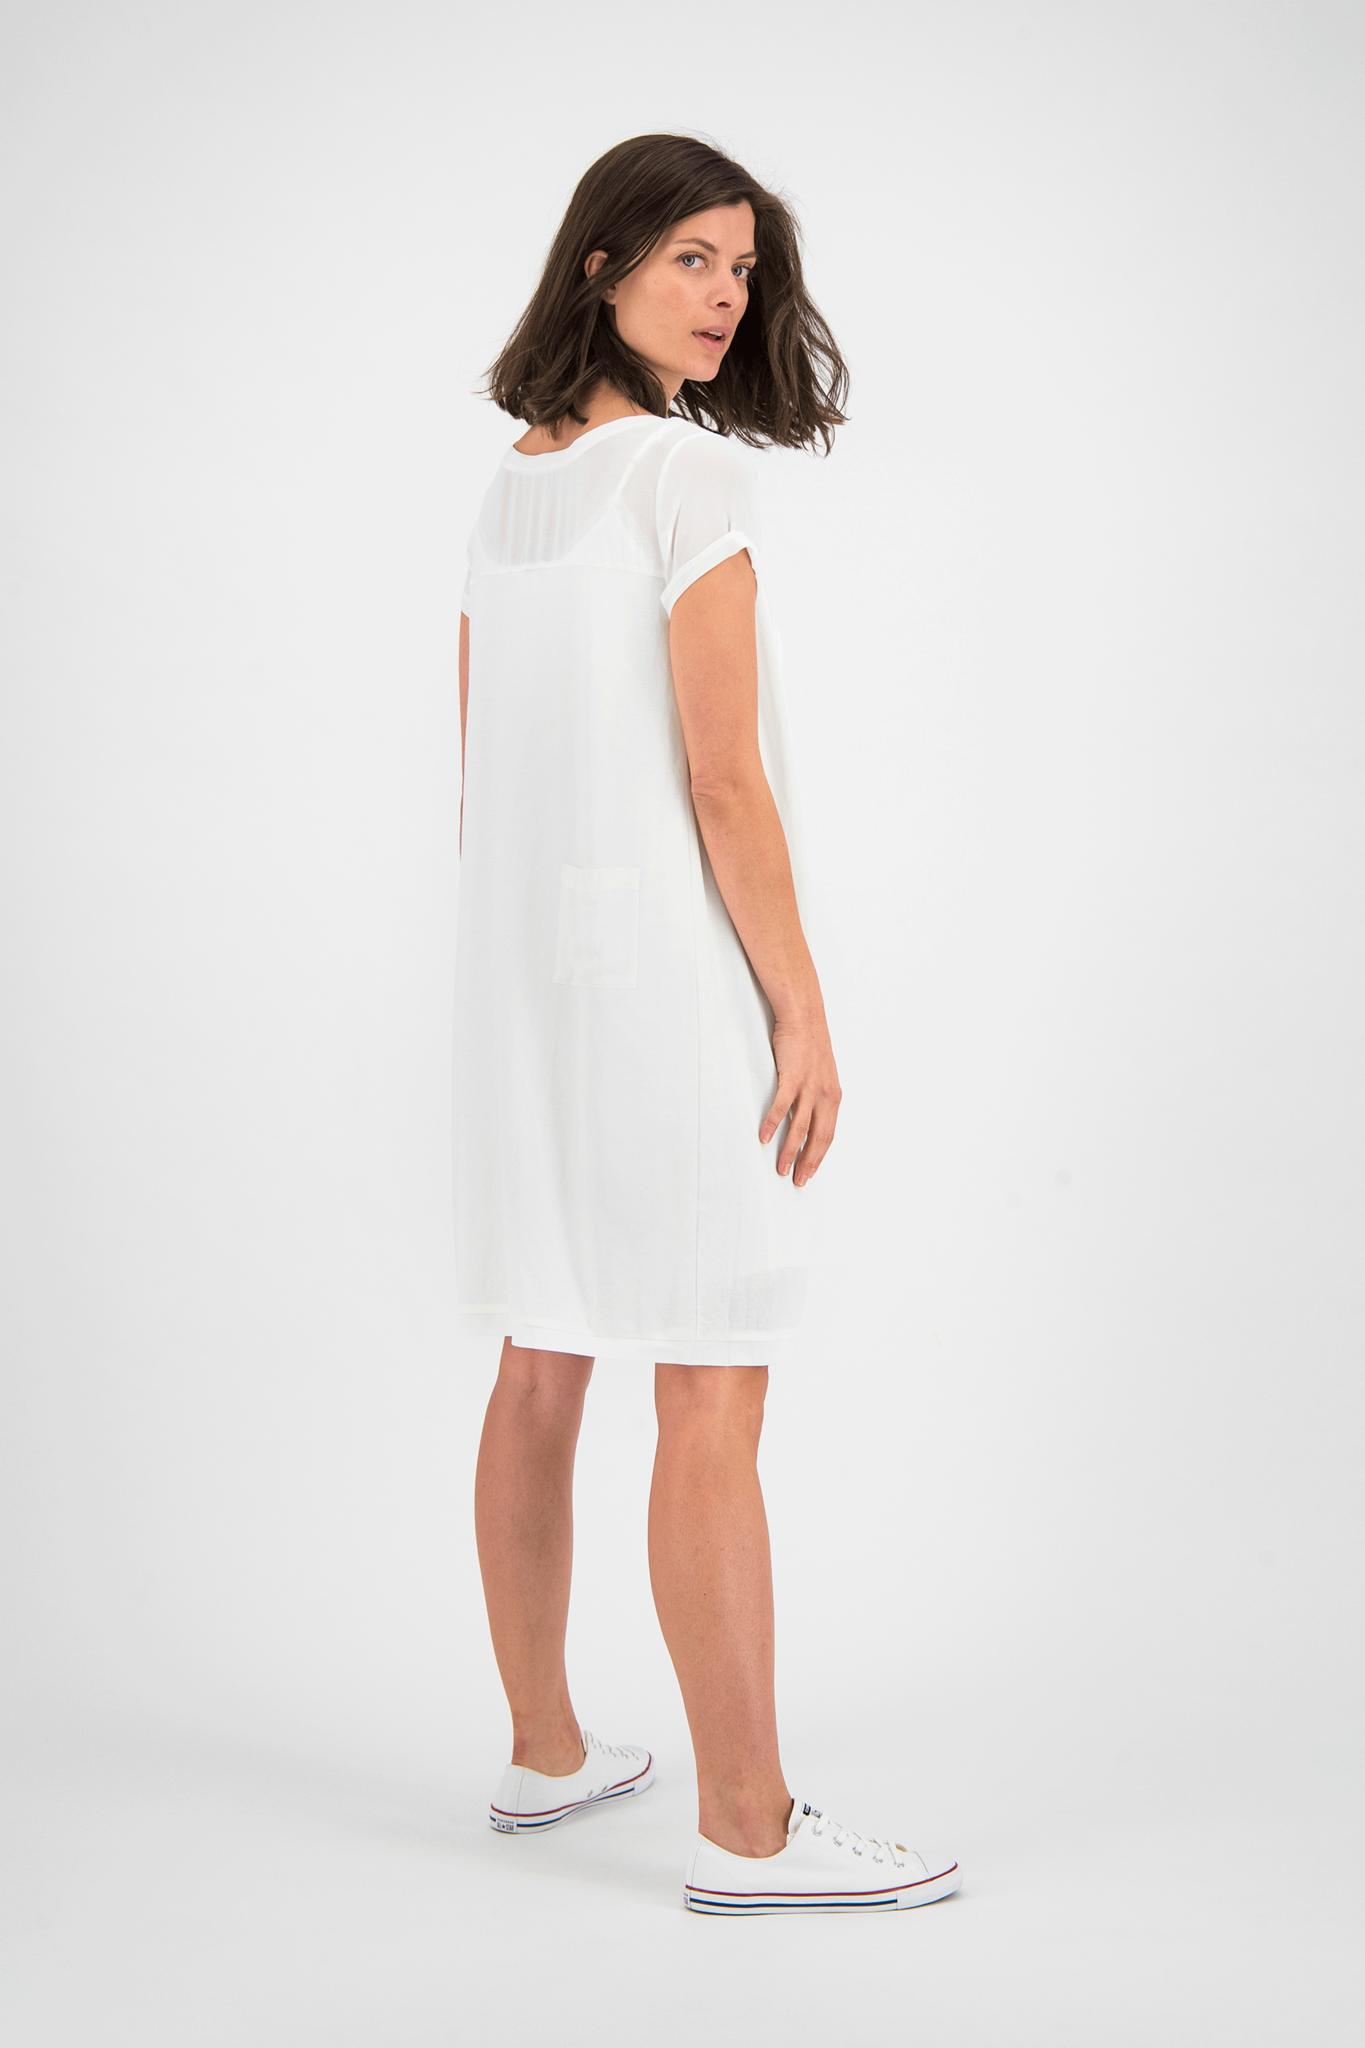 SYLVER Crêpe Stretch Dress-Blouse - Gebroken Wit